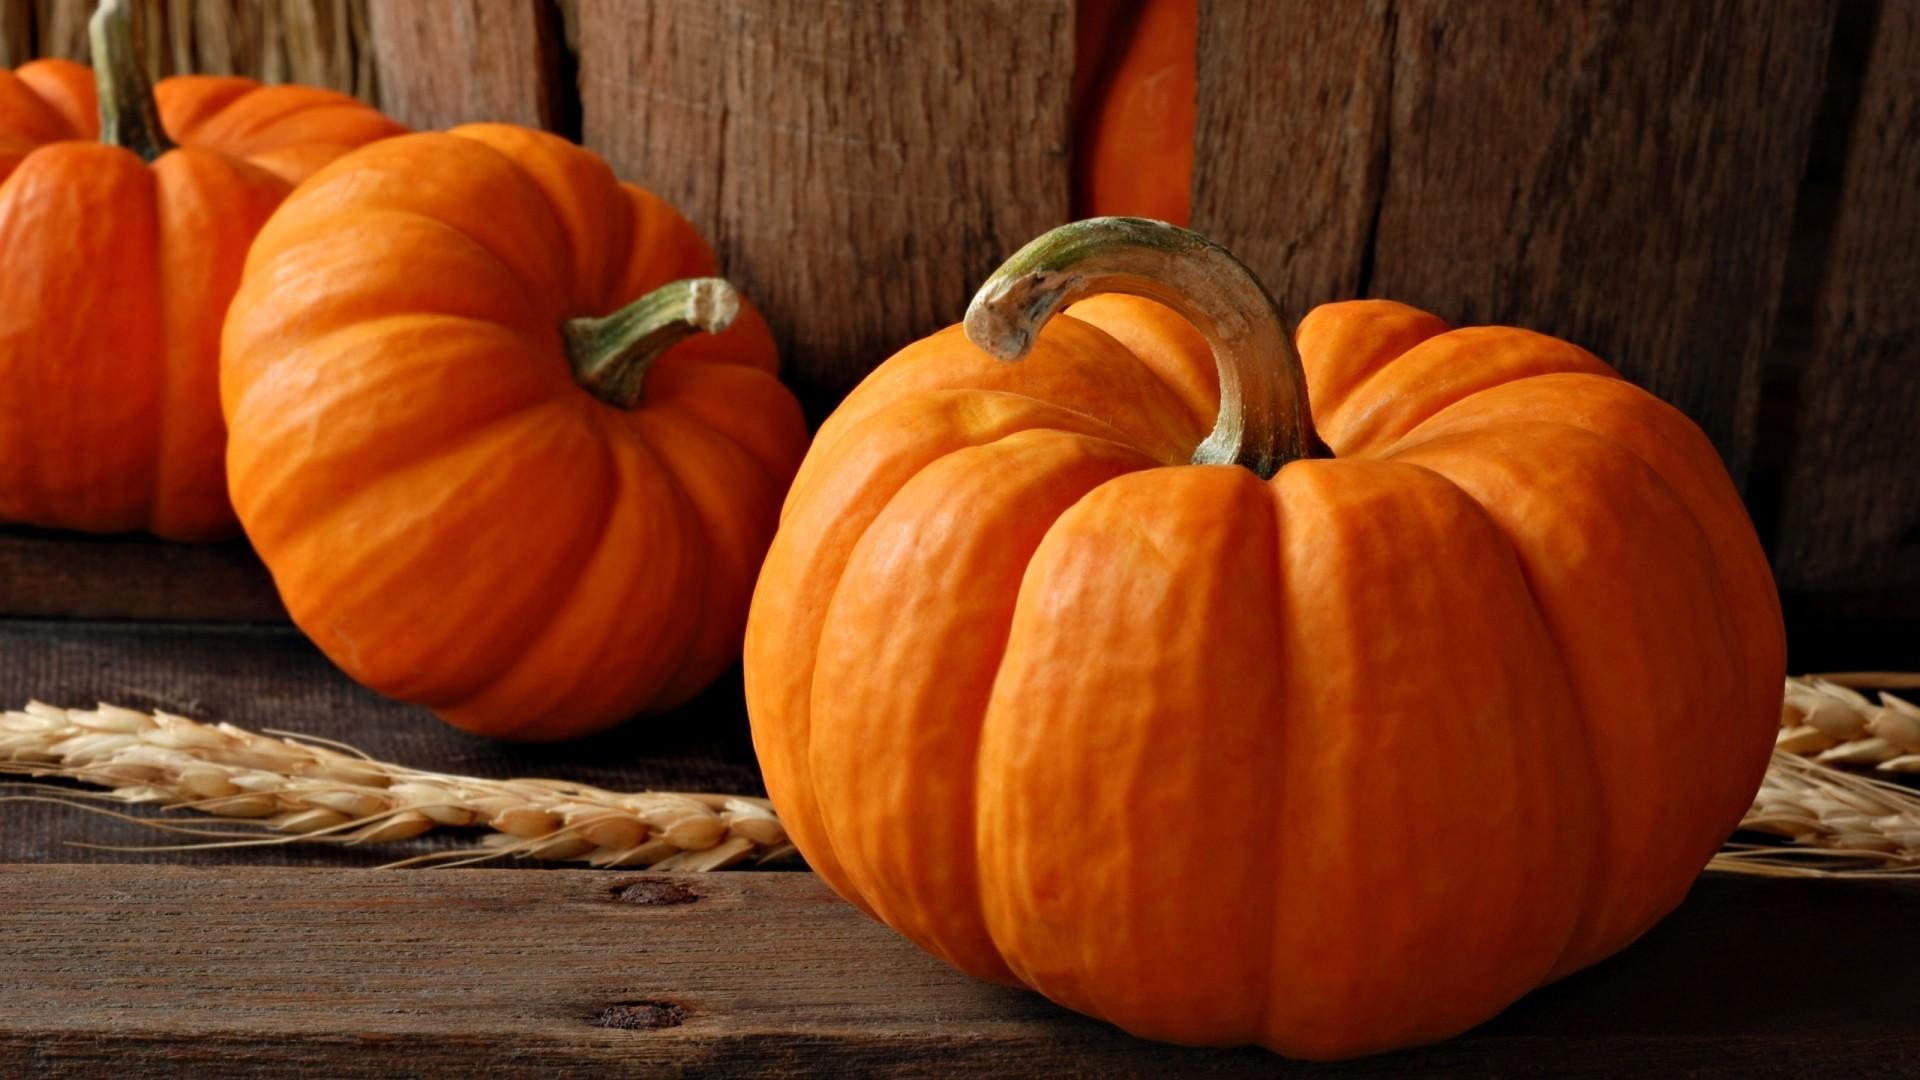 Pumpkin Wallpapers